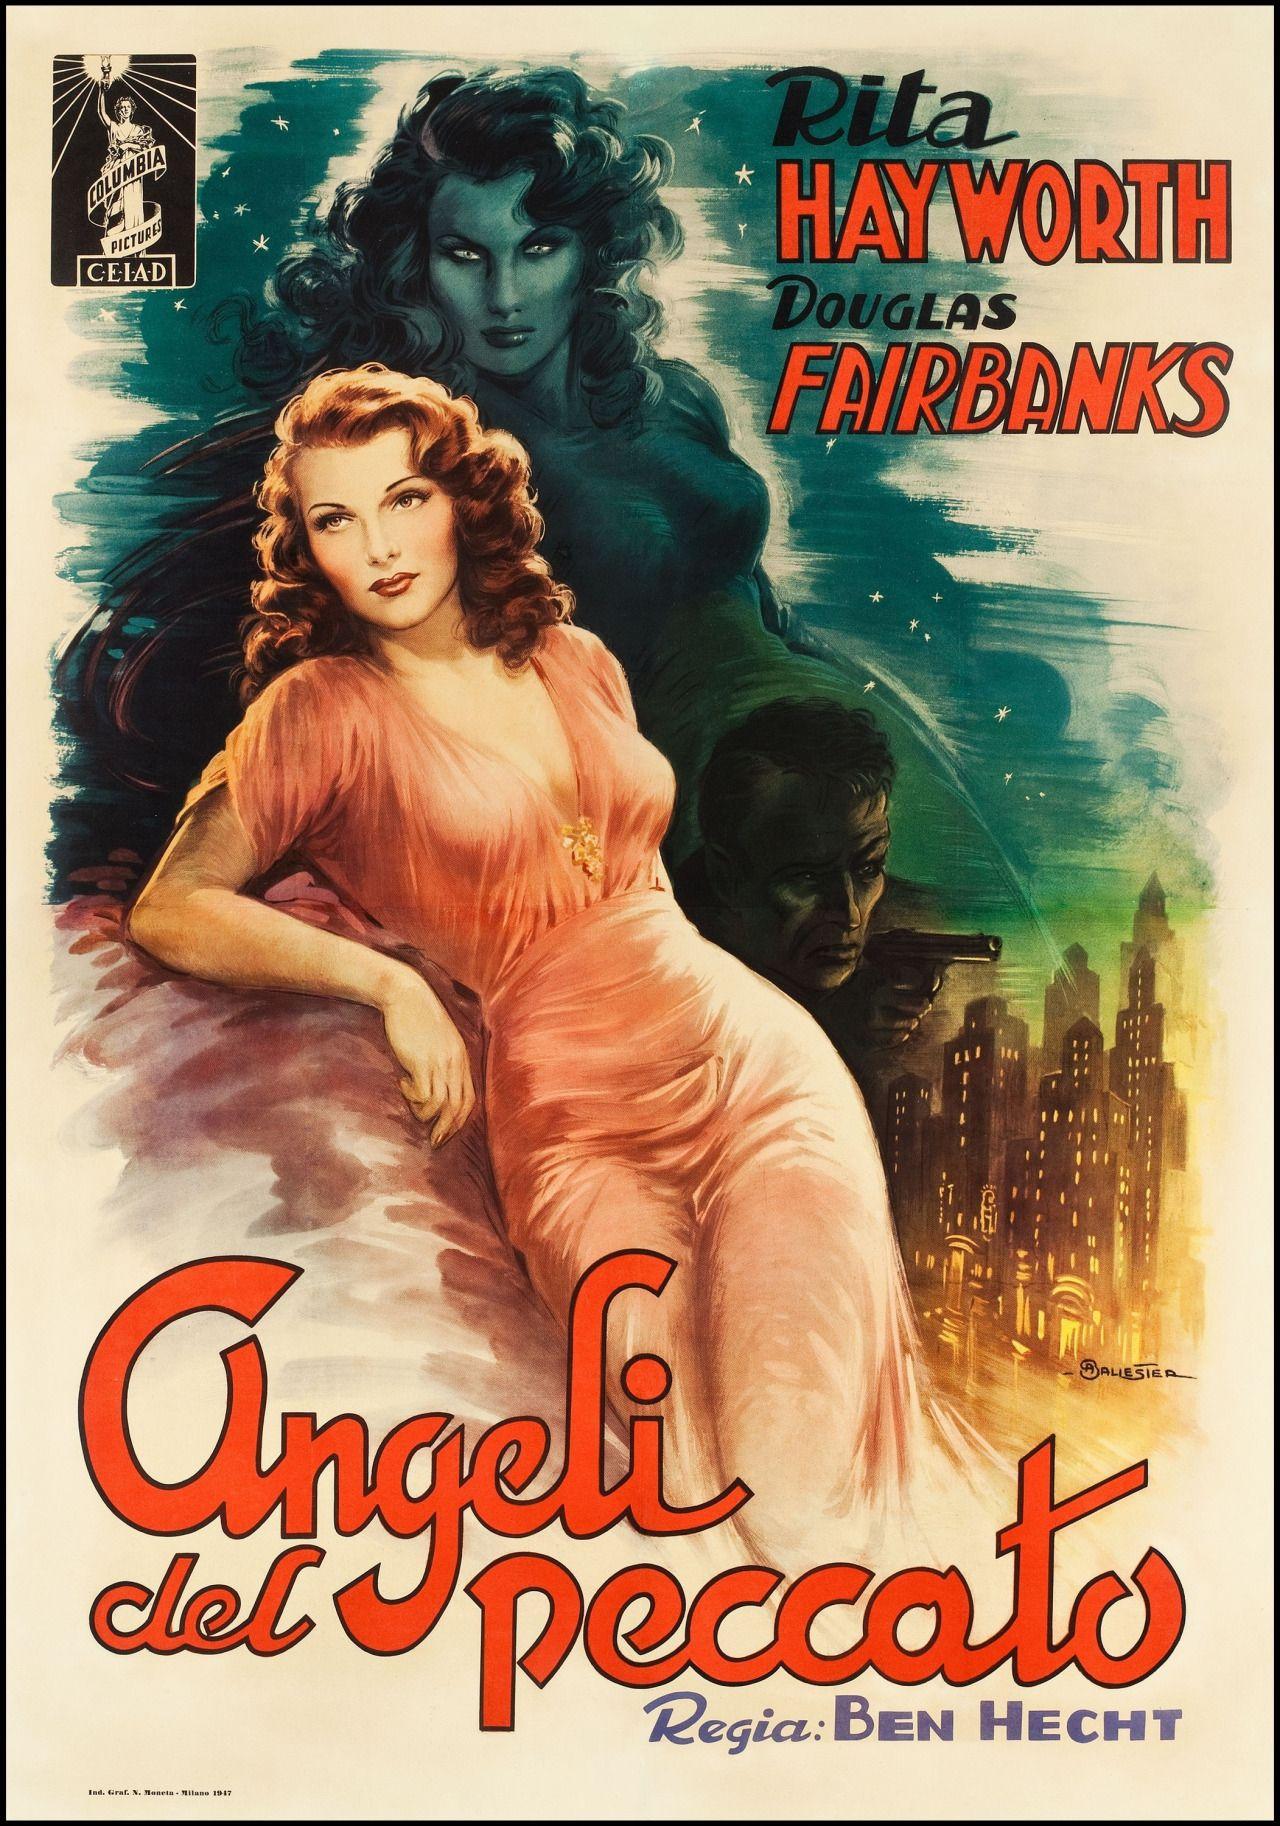 An Italian poster for the 1940 Rita Hayworth film noir ANGELS OVER  BROADWAY. (Source: ha.com)